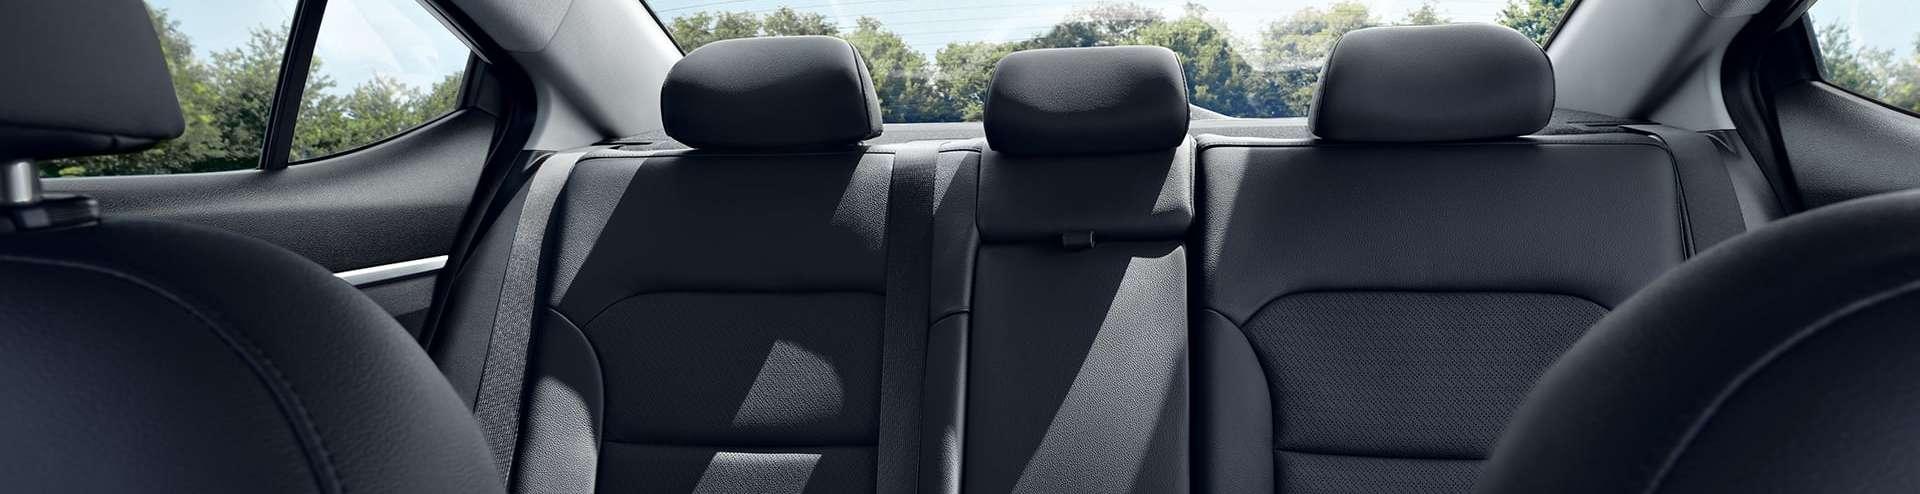 2020 Elantra Rear Seats